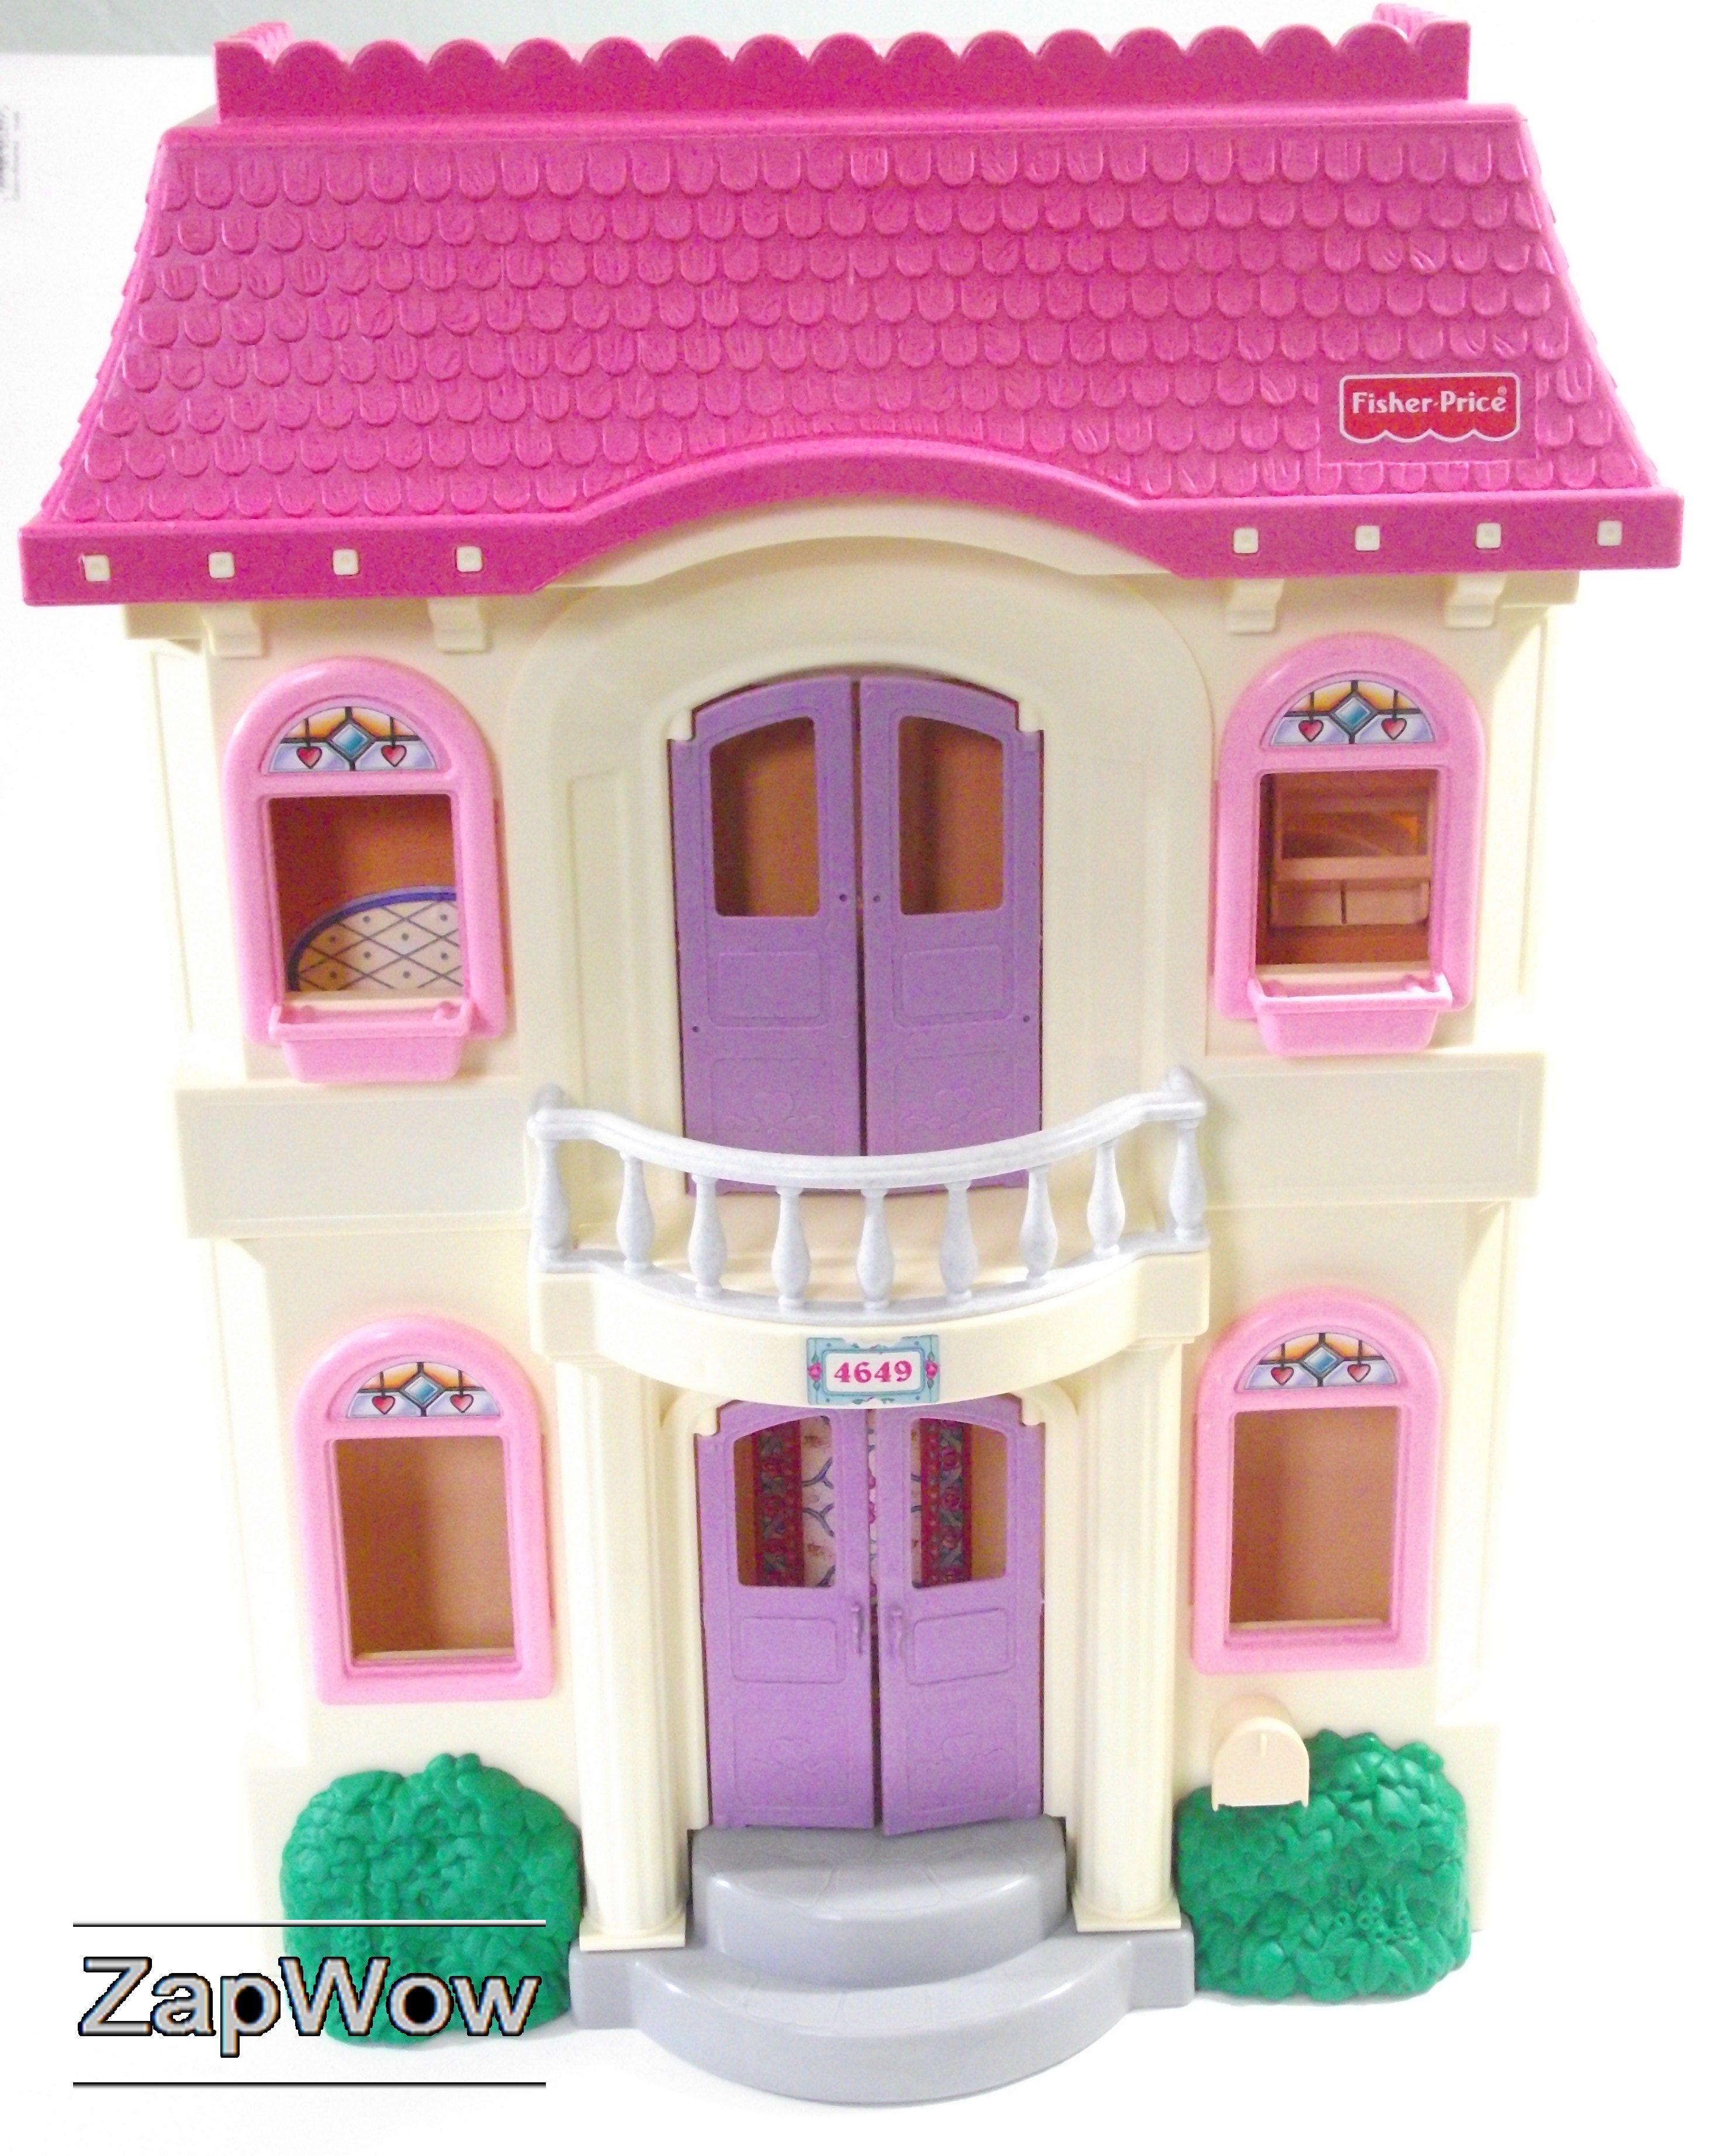 FisherPrice Loving Family Folding Doll House 2002. SOLD £